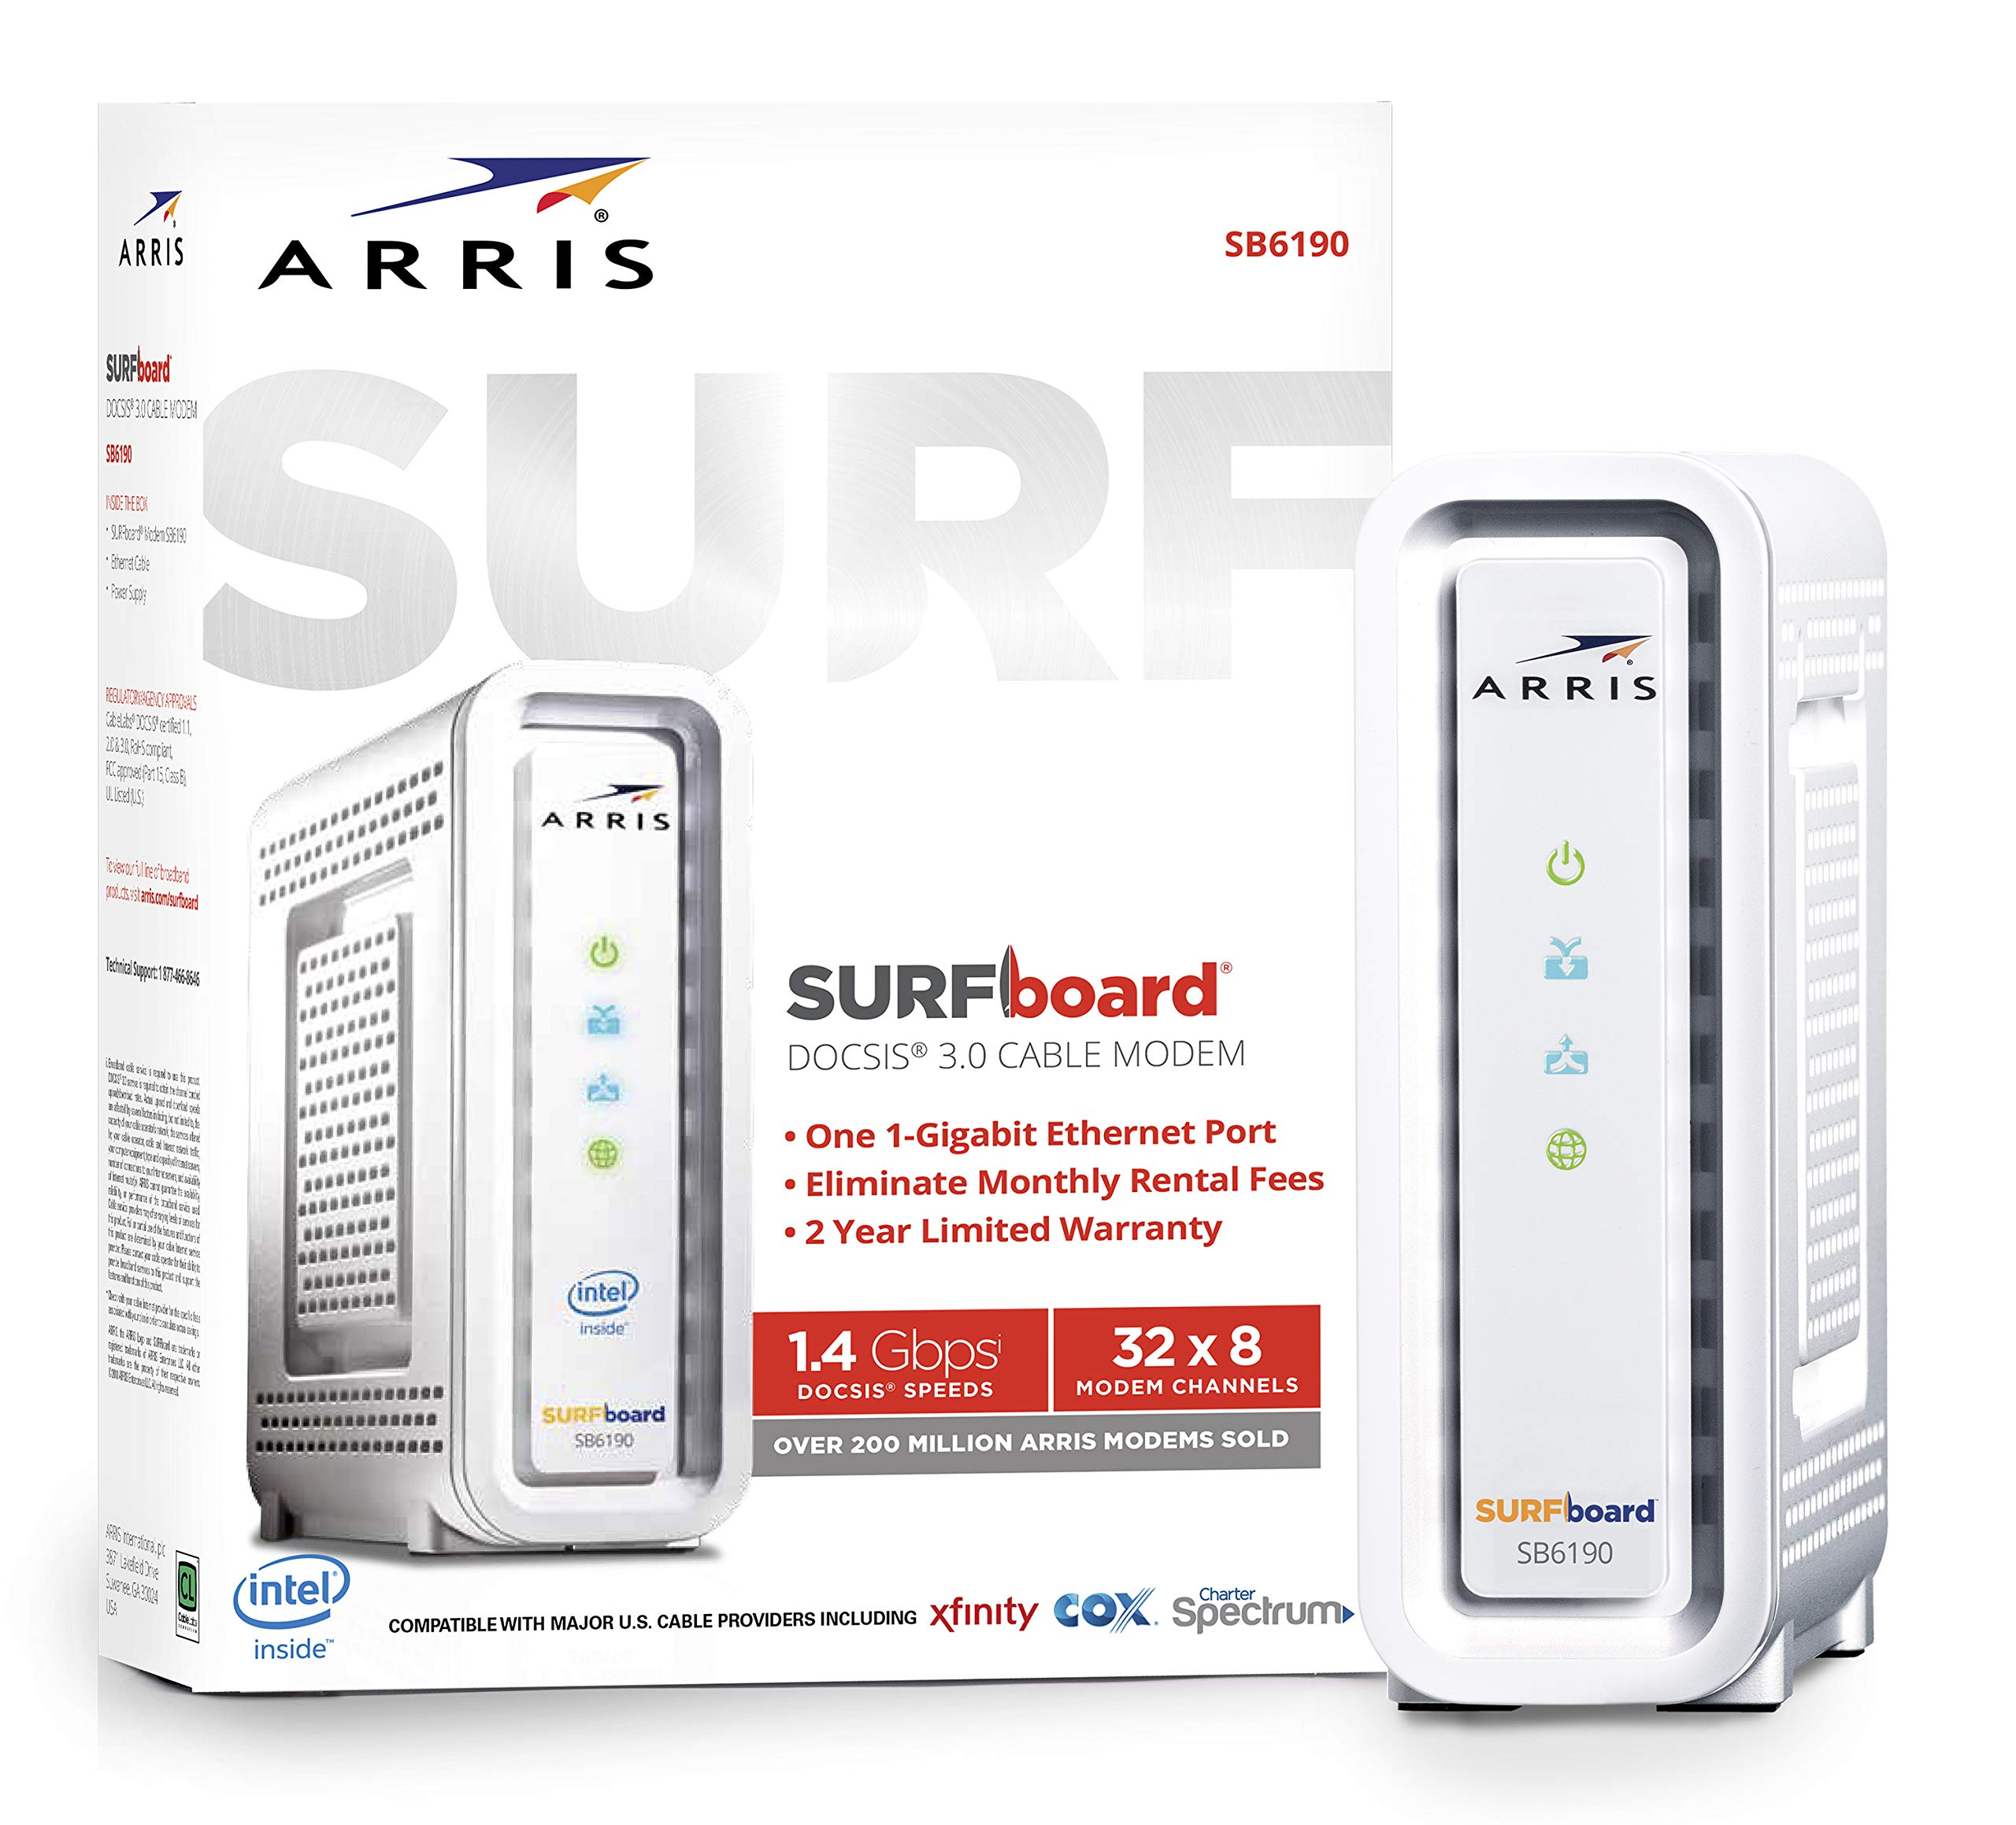 Cable Modem Wi Fi Router Comcast Xfinity Spectrum Cox Mediacom Internet Wireless